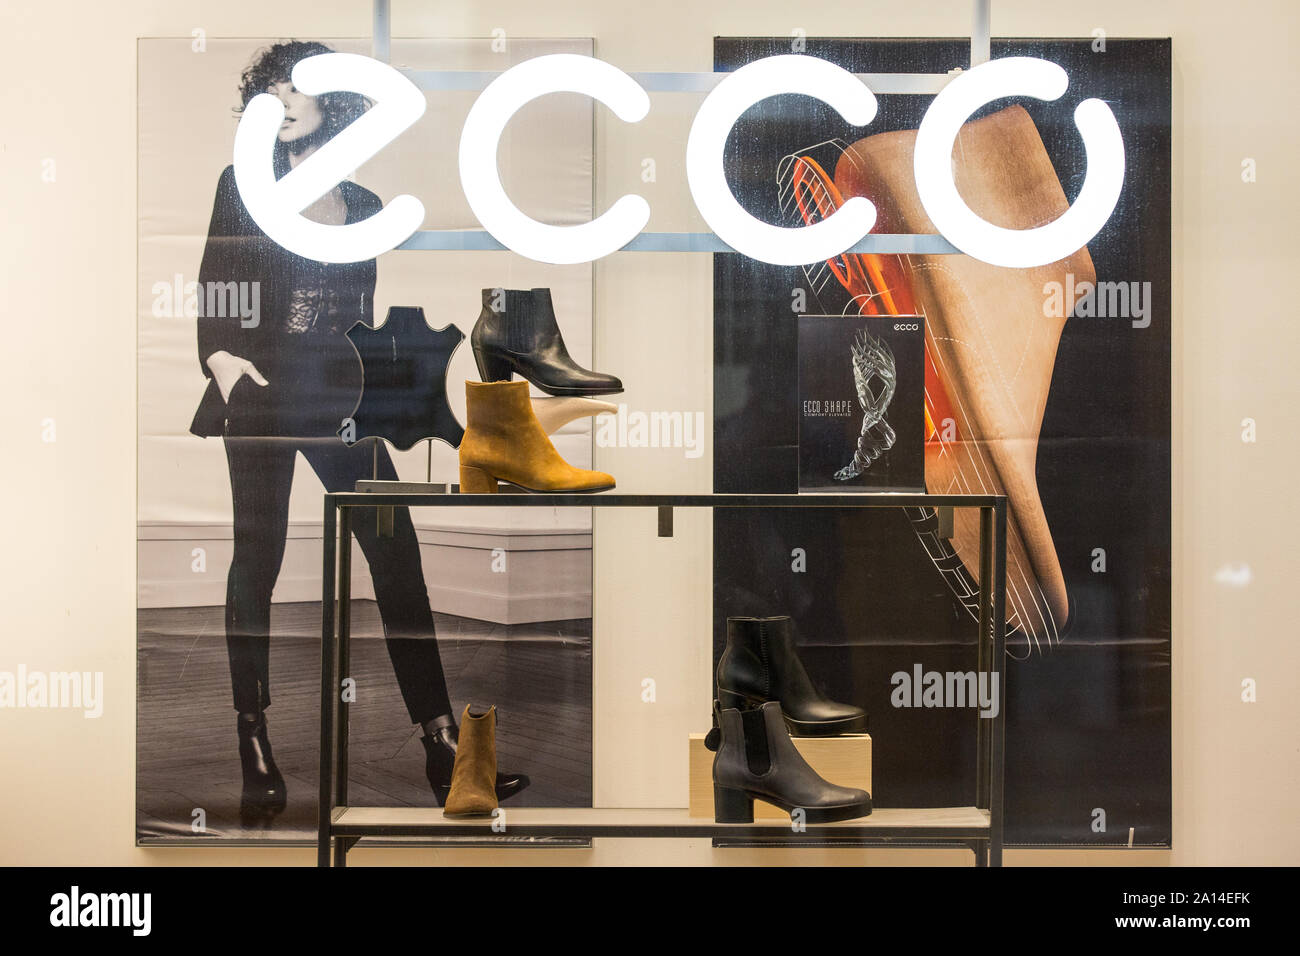 Shoe house Ecco, Tauentzien, Charlottenburg, Berlin, Germany